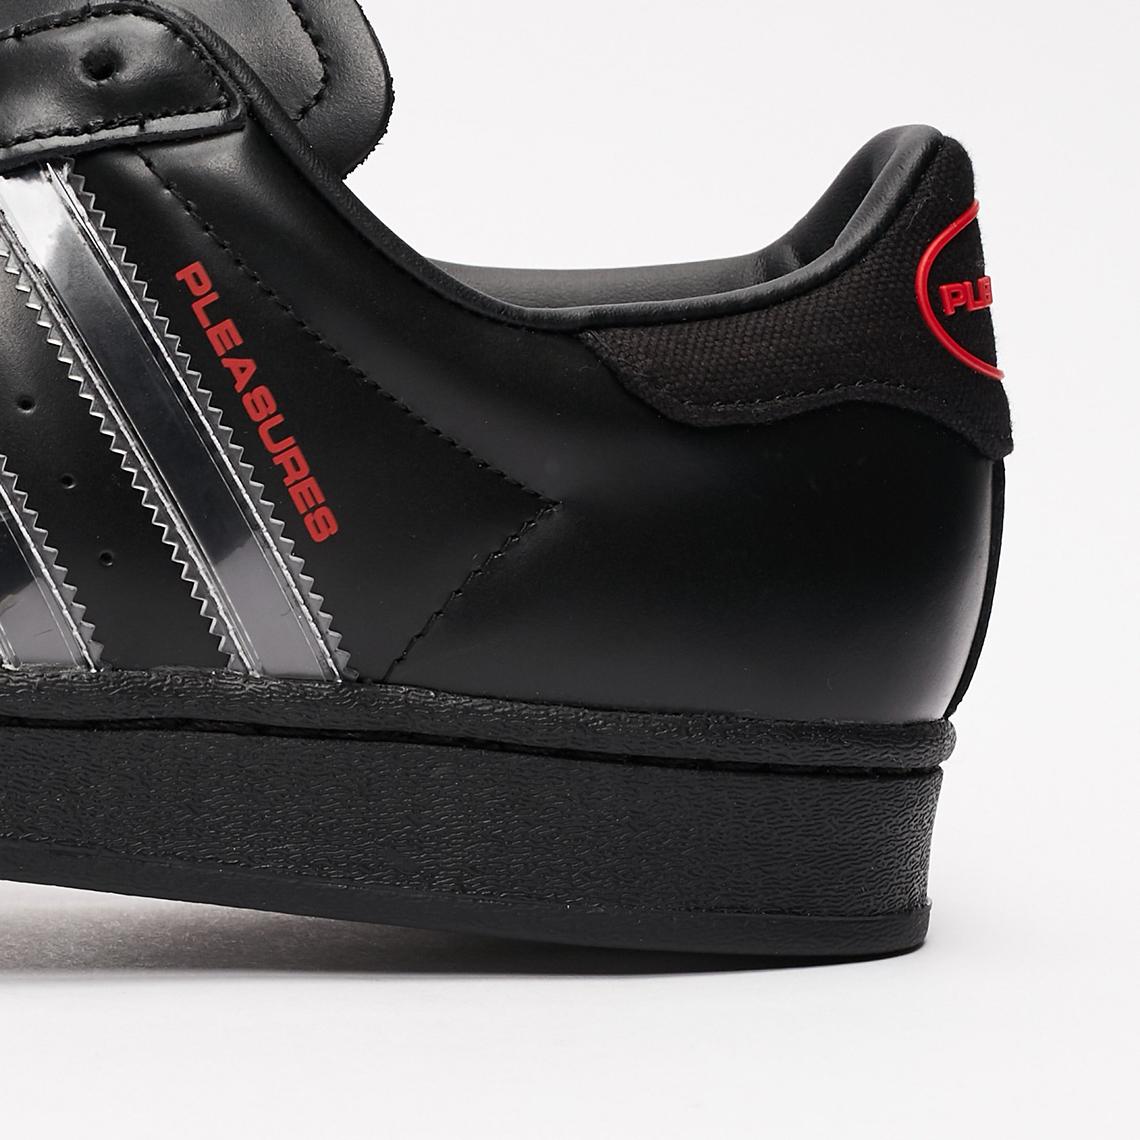 PLEASURES-adidas-Superstar-GY5691-6.jpg?w=1140